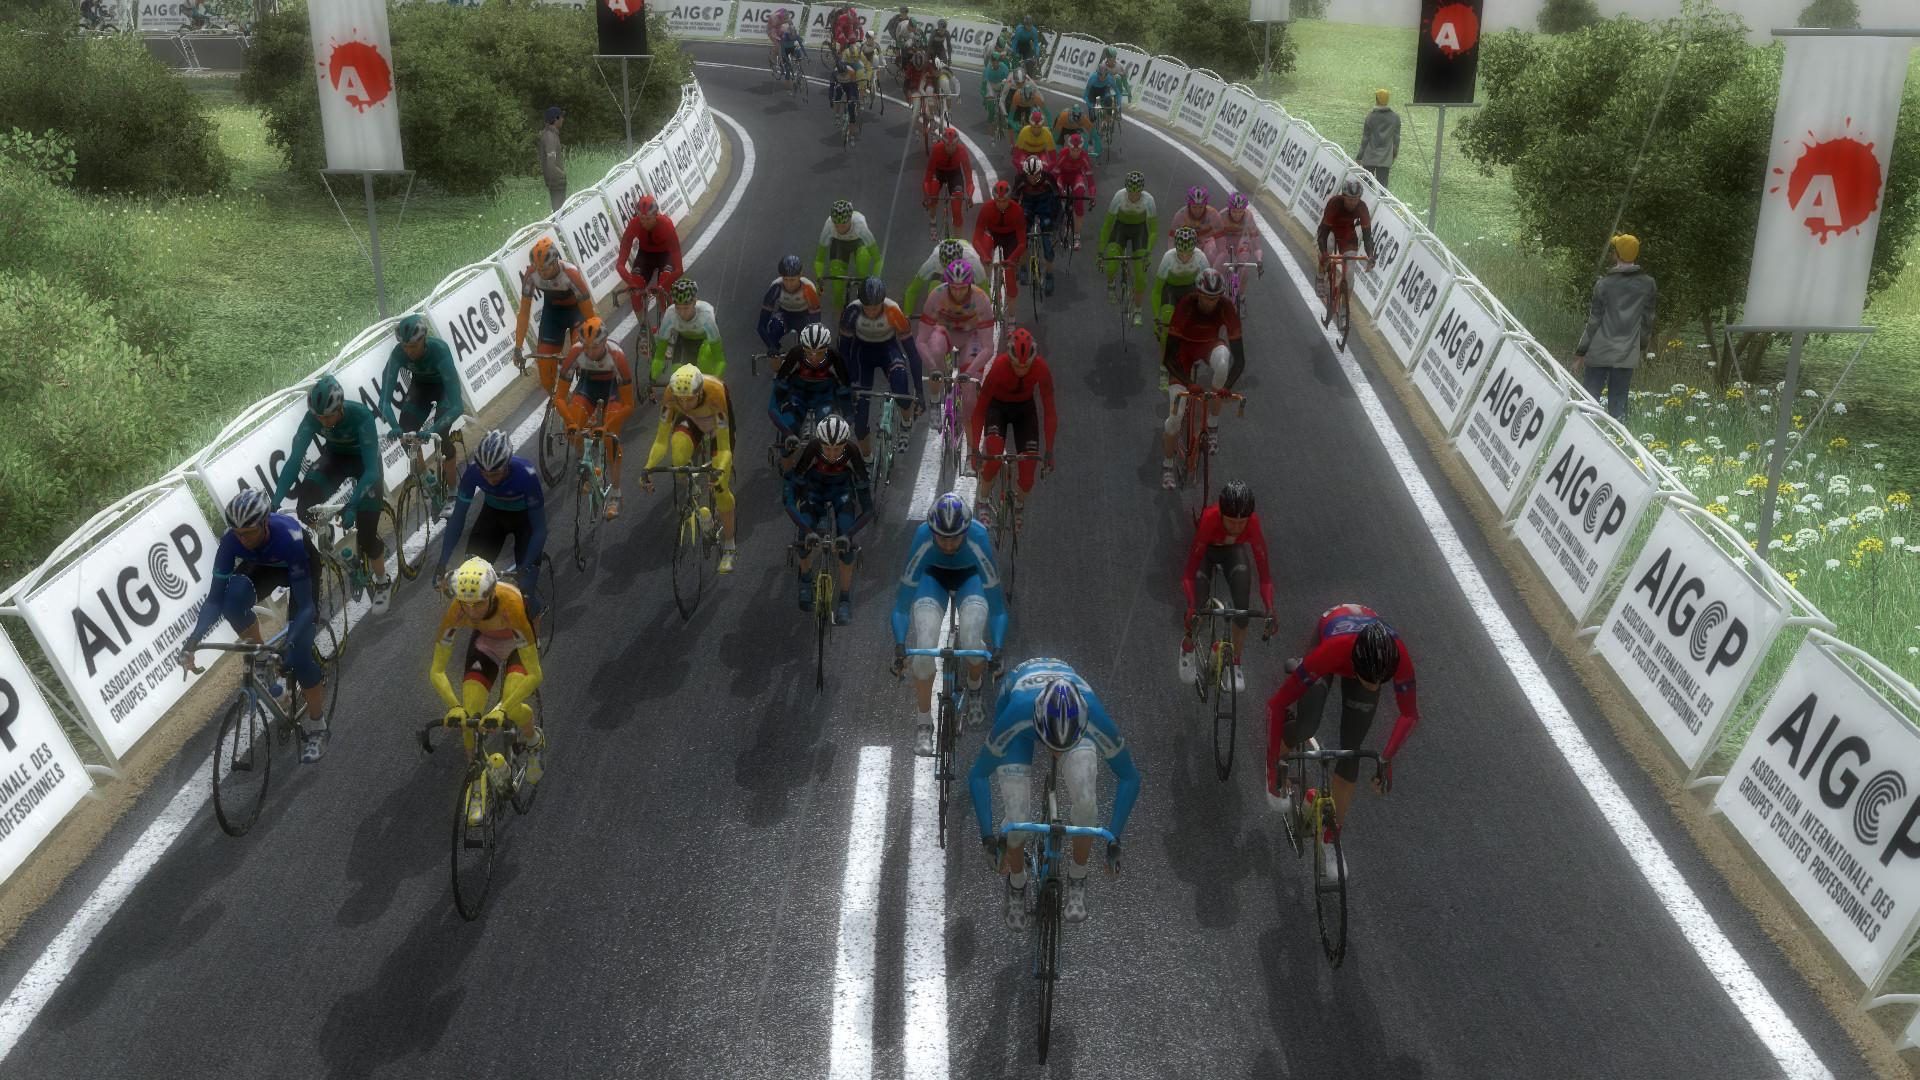 pcmdaily.com/images/mg/2019/Races/PTHC/Pologne/E5/22.jpg